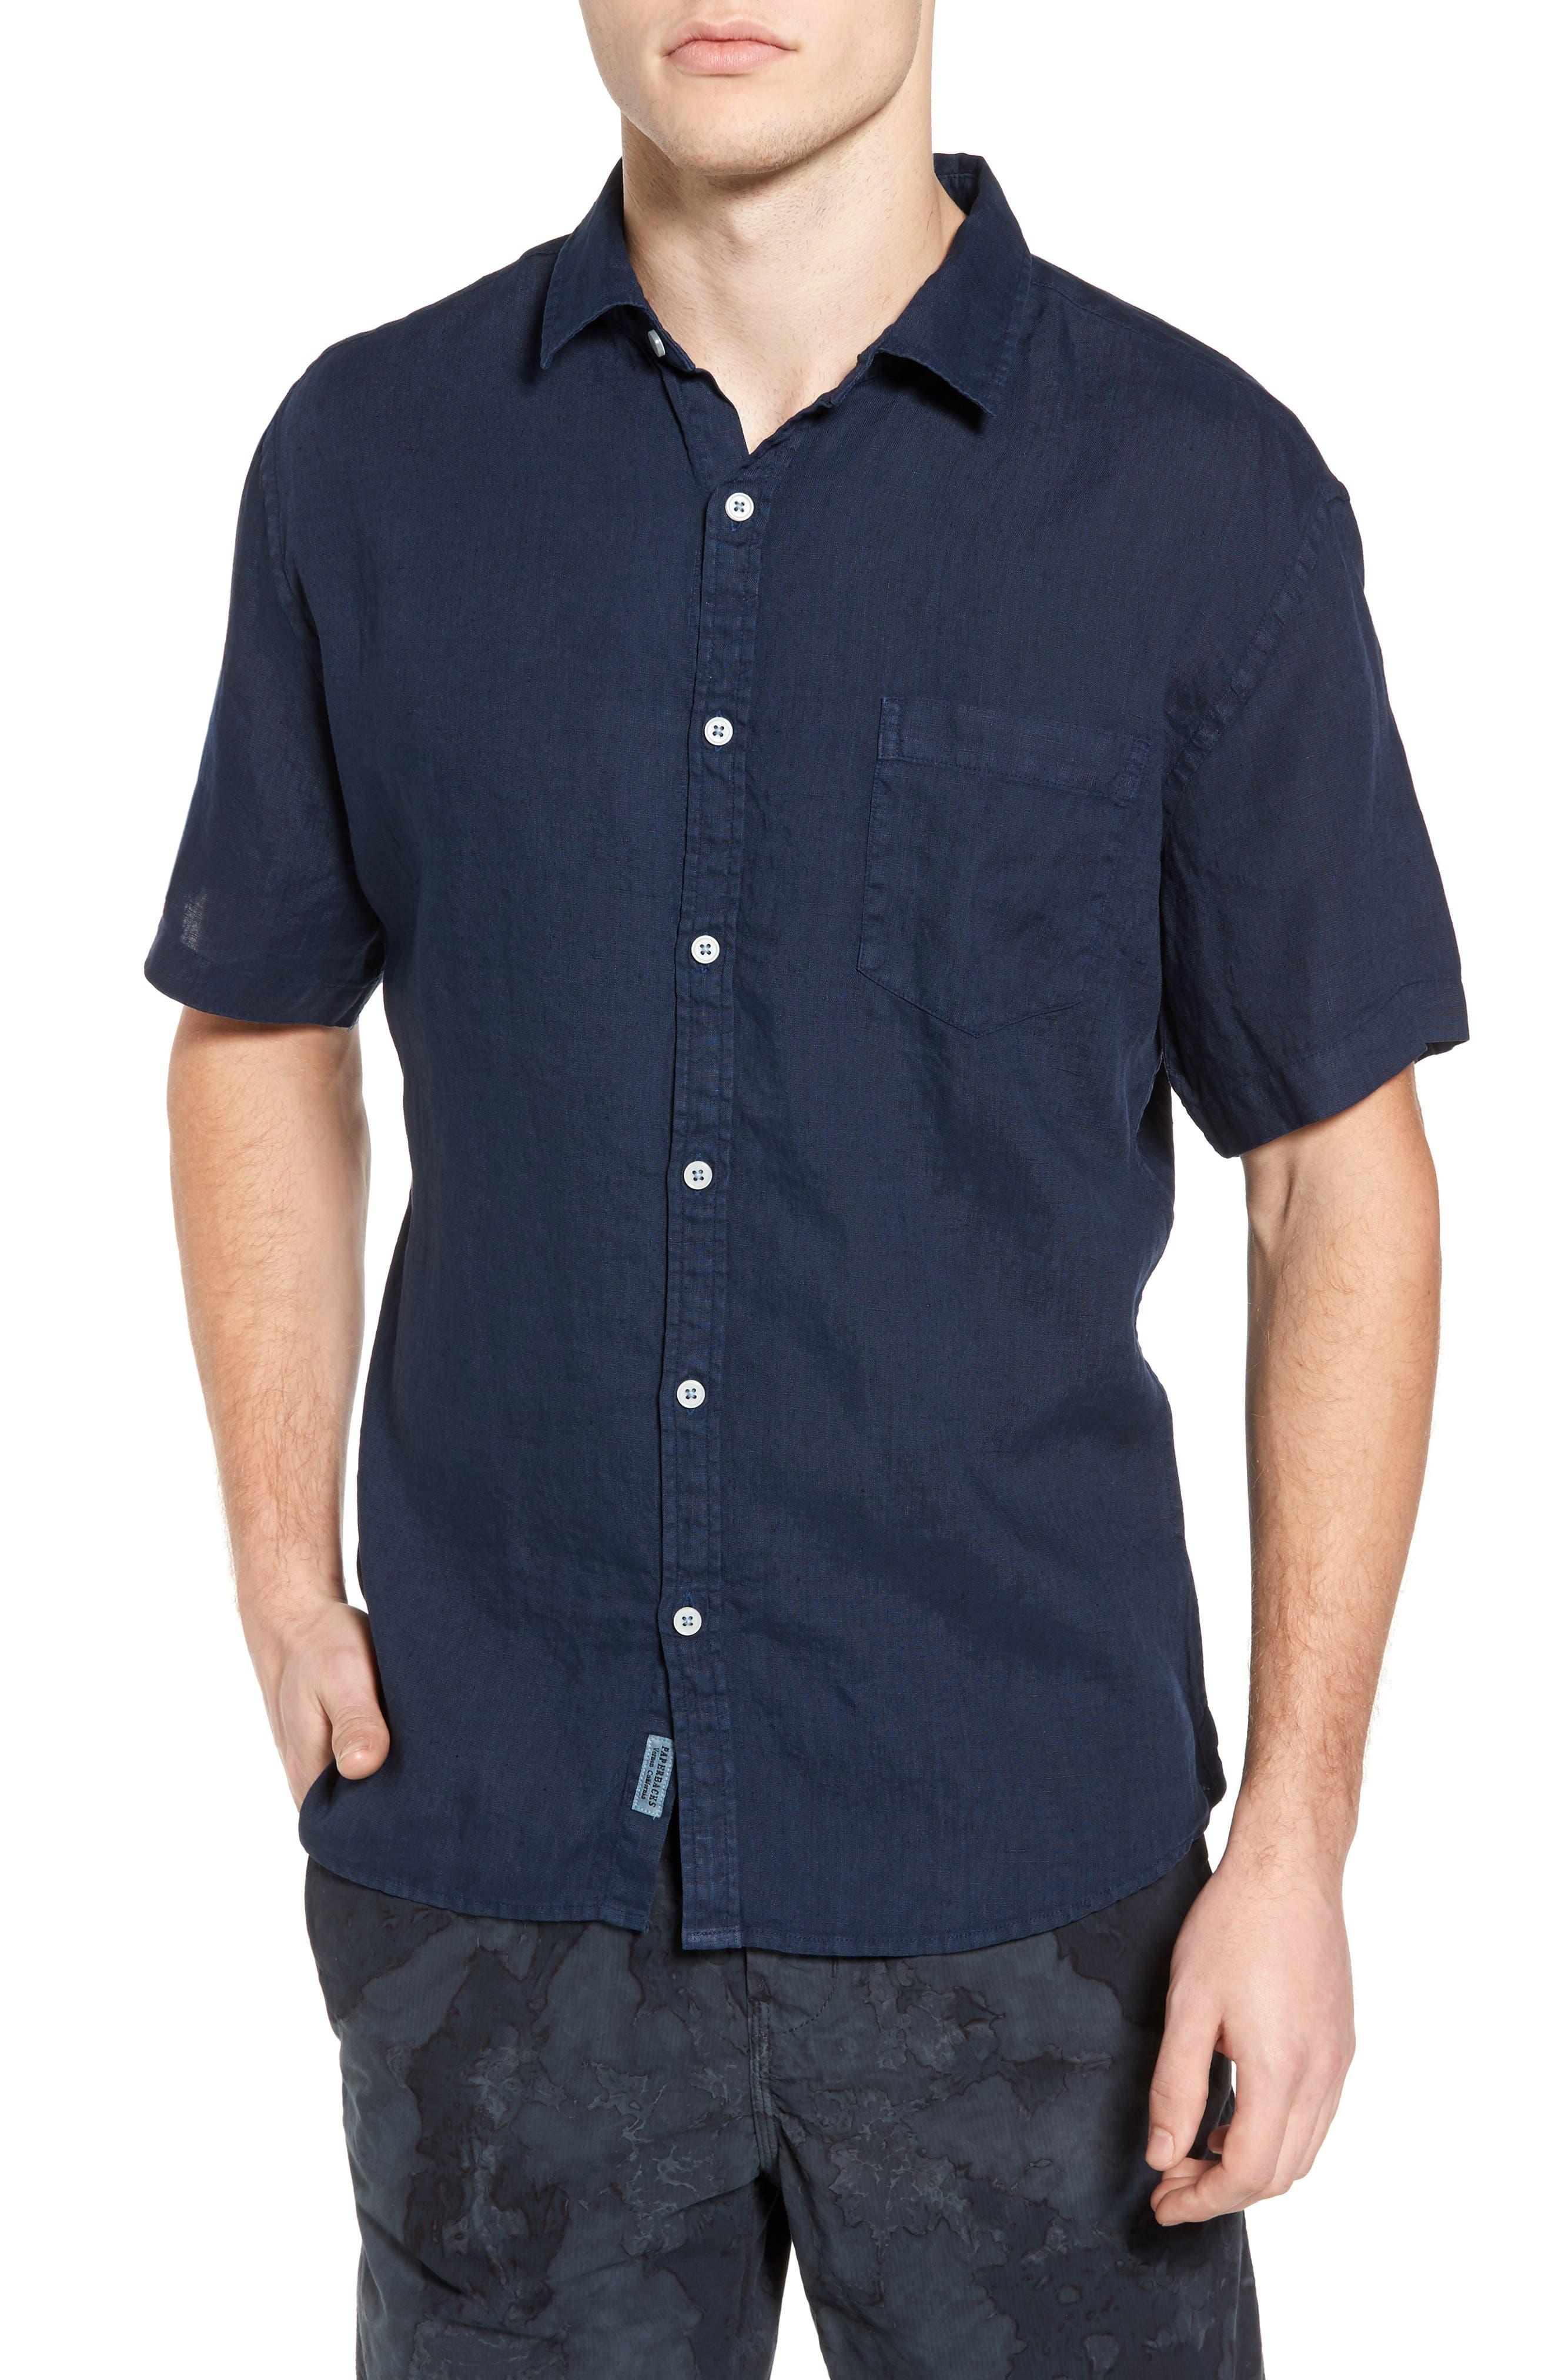 Alternate Image 1 Selected - Original Paperbacks Rome Trim Fit Linen Sport Shirt